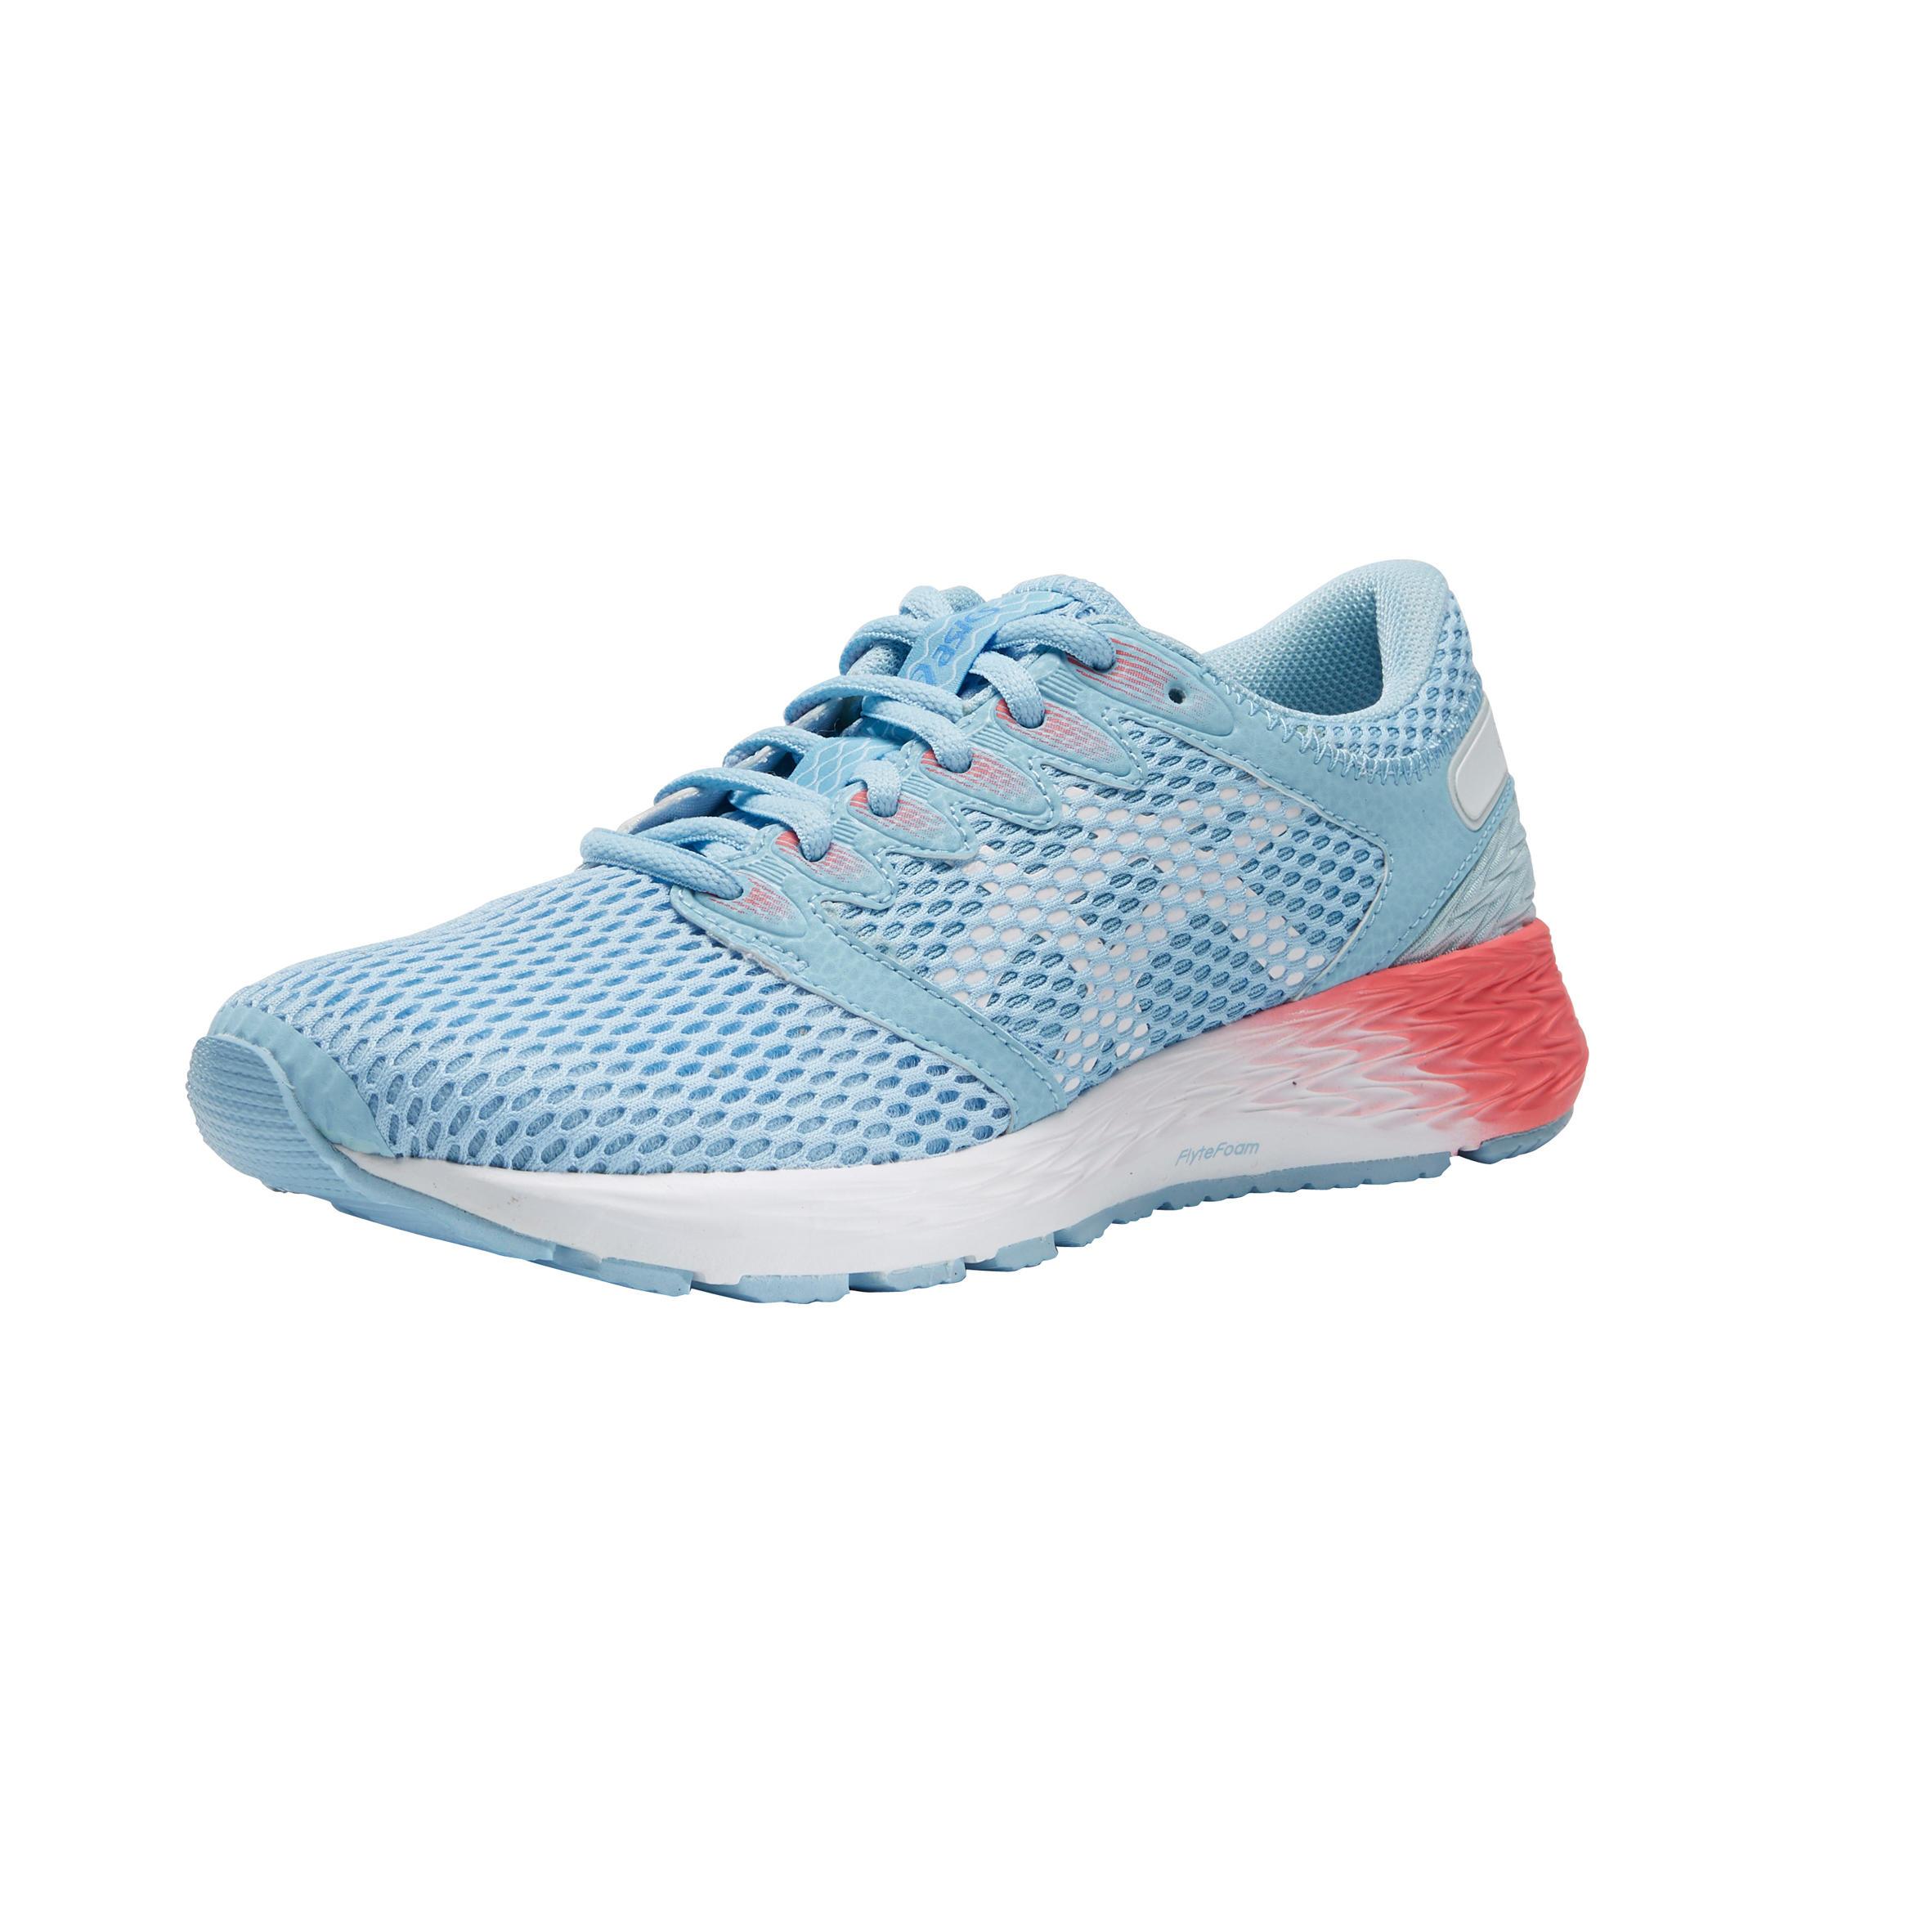 1f6732d33 Comprar Zapatillas de running para correr mujer